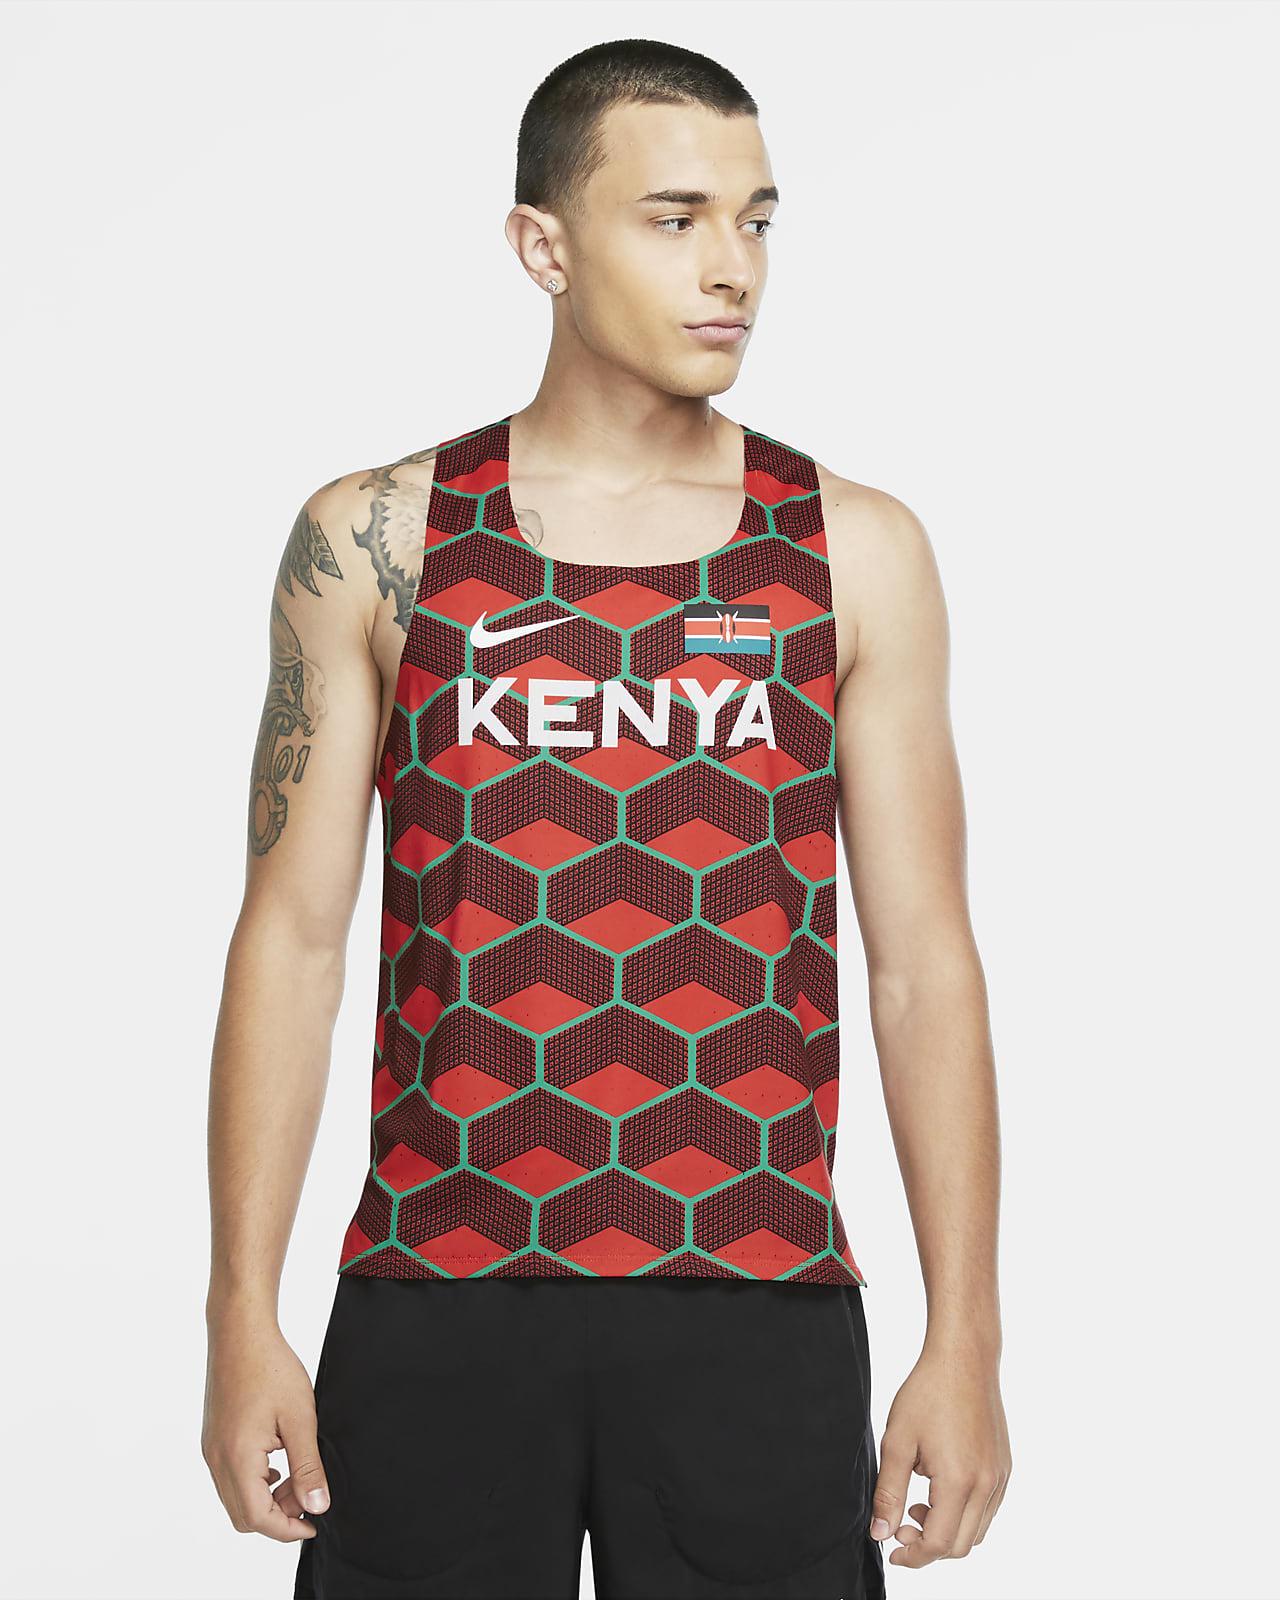 Nike Dri-FIT ADV Team Kenya AeroSwift Men's Running Vest